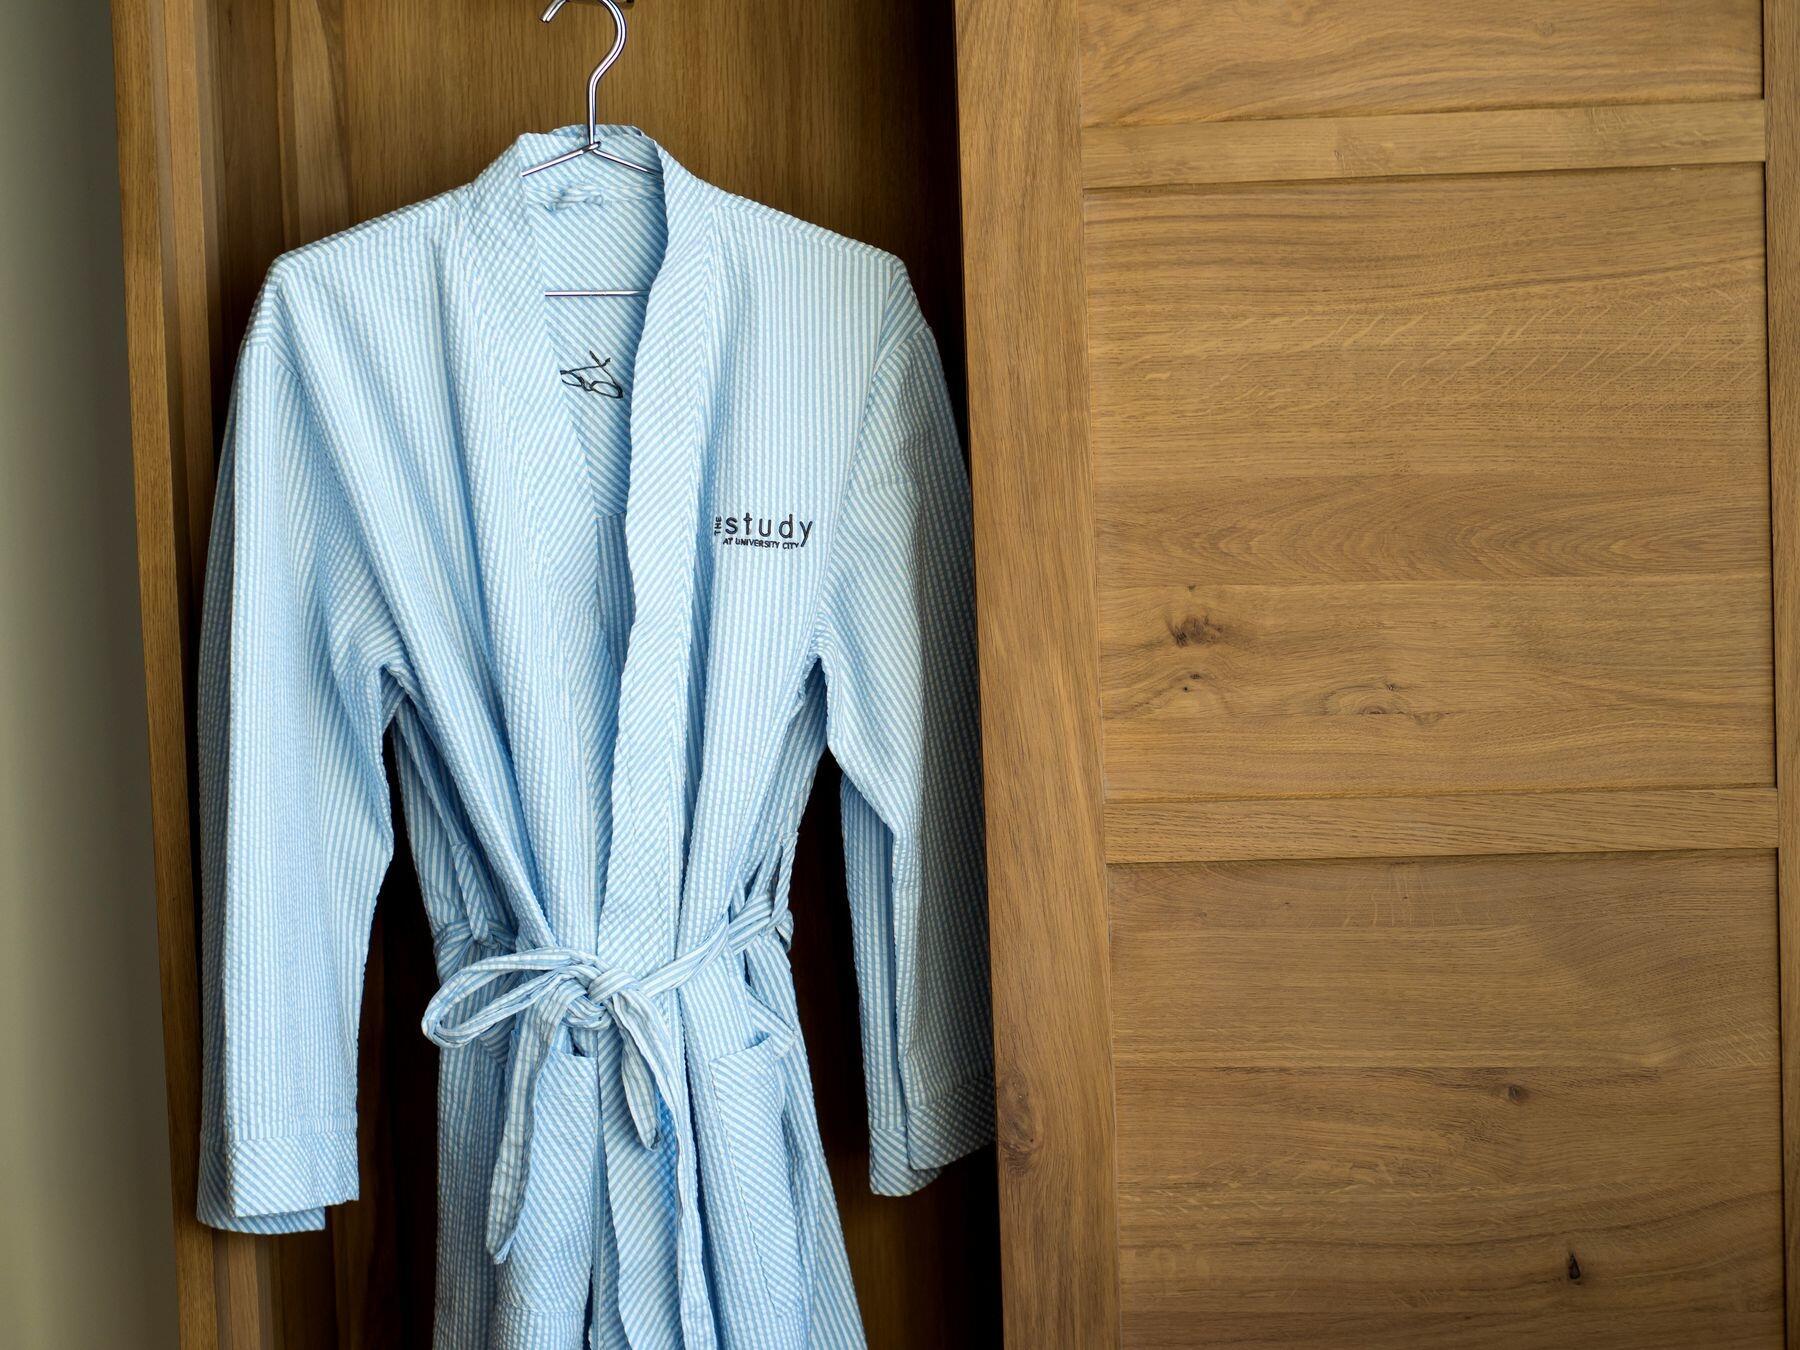 Robe hanging in closet